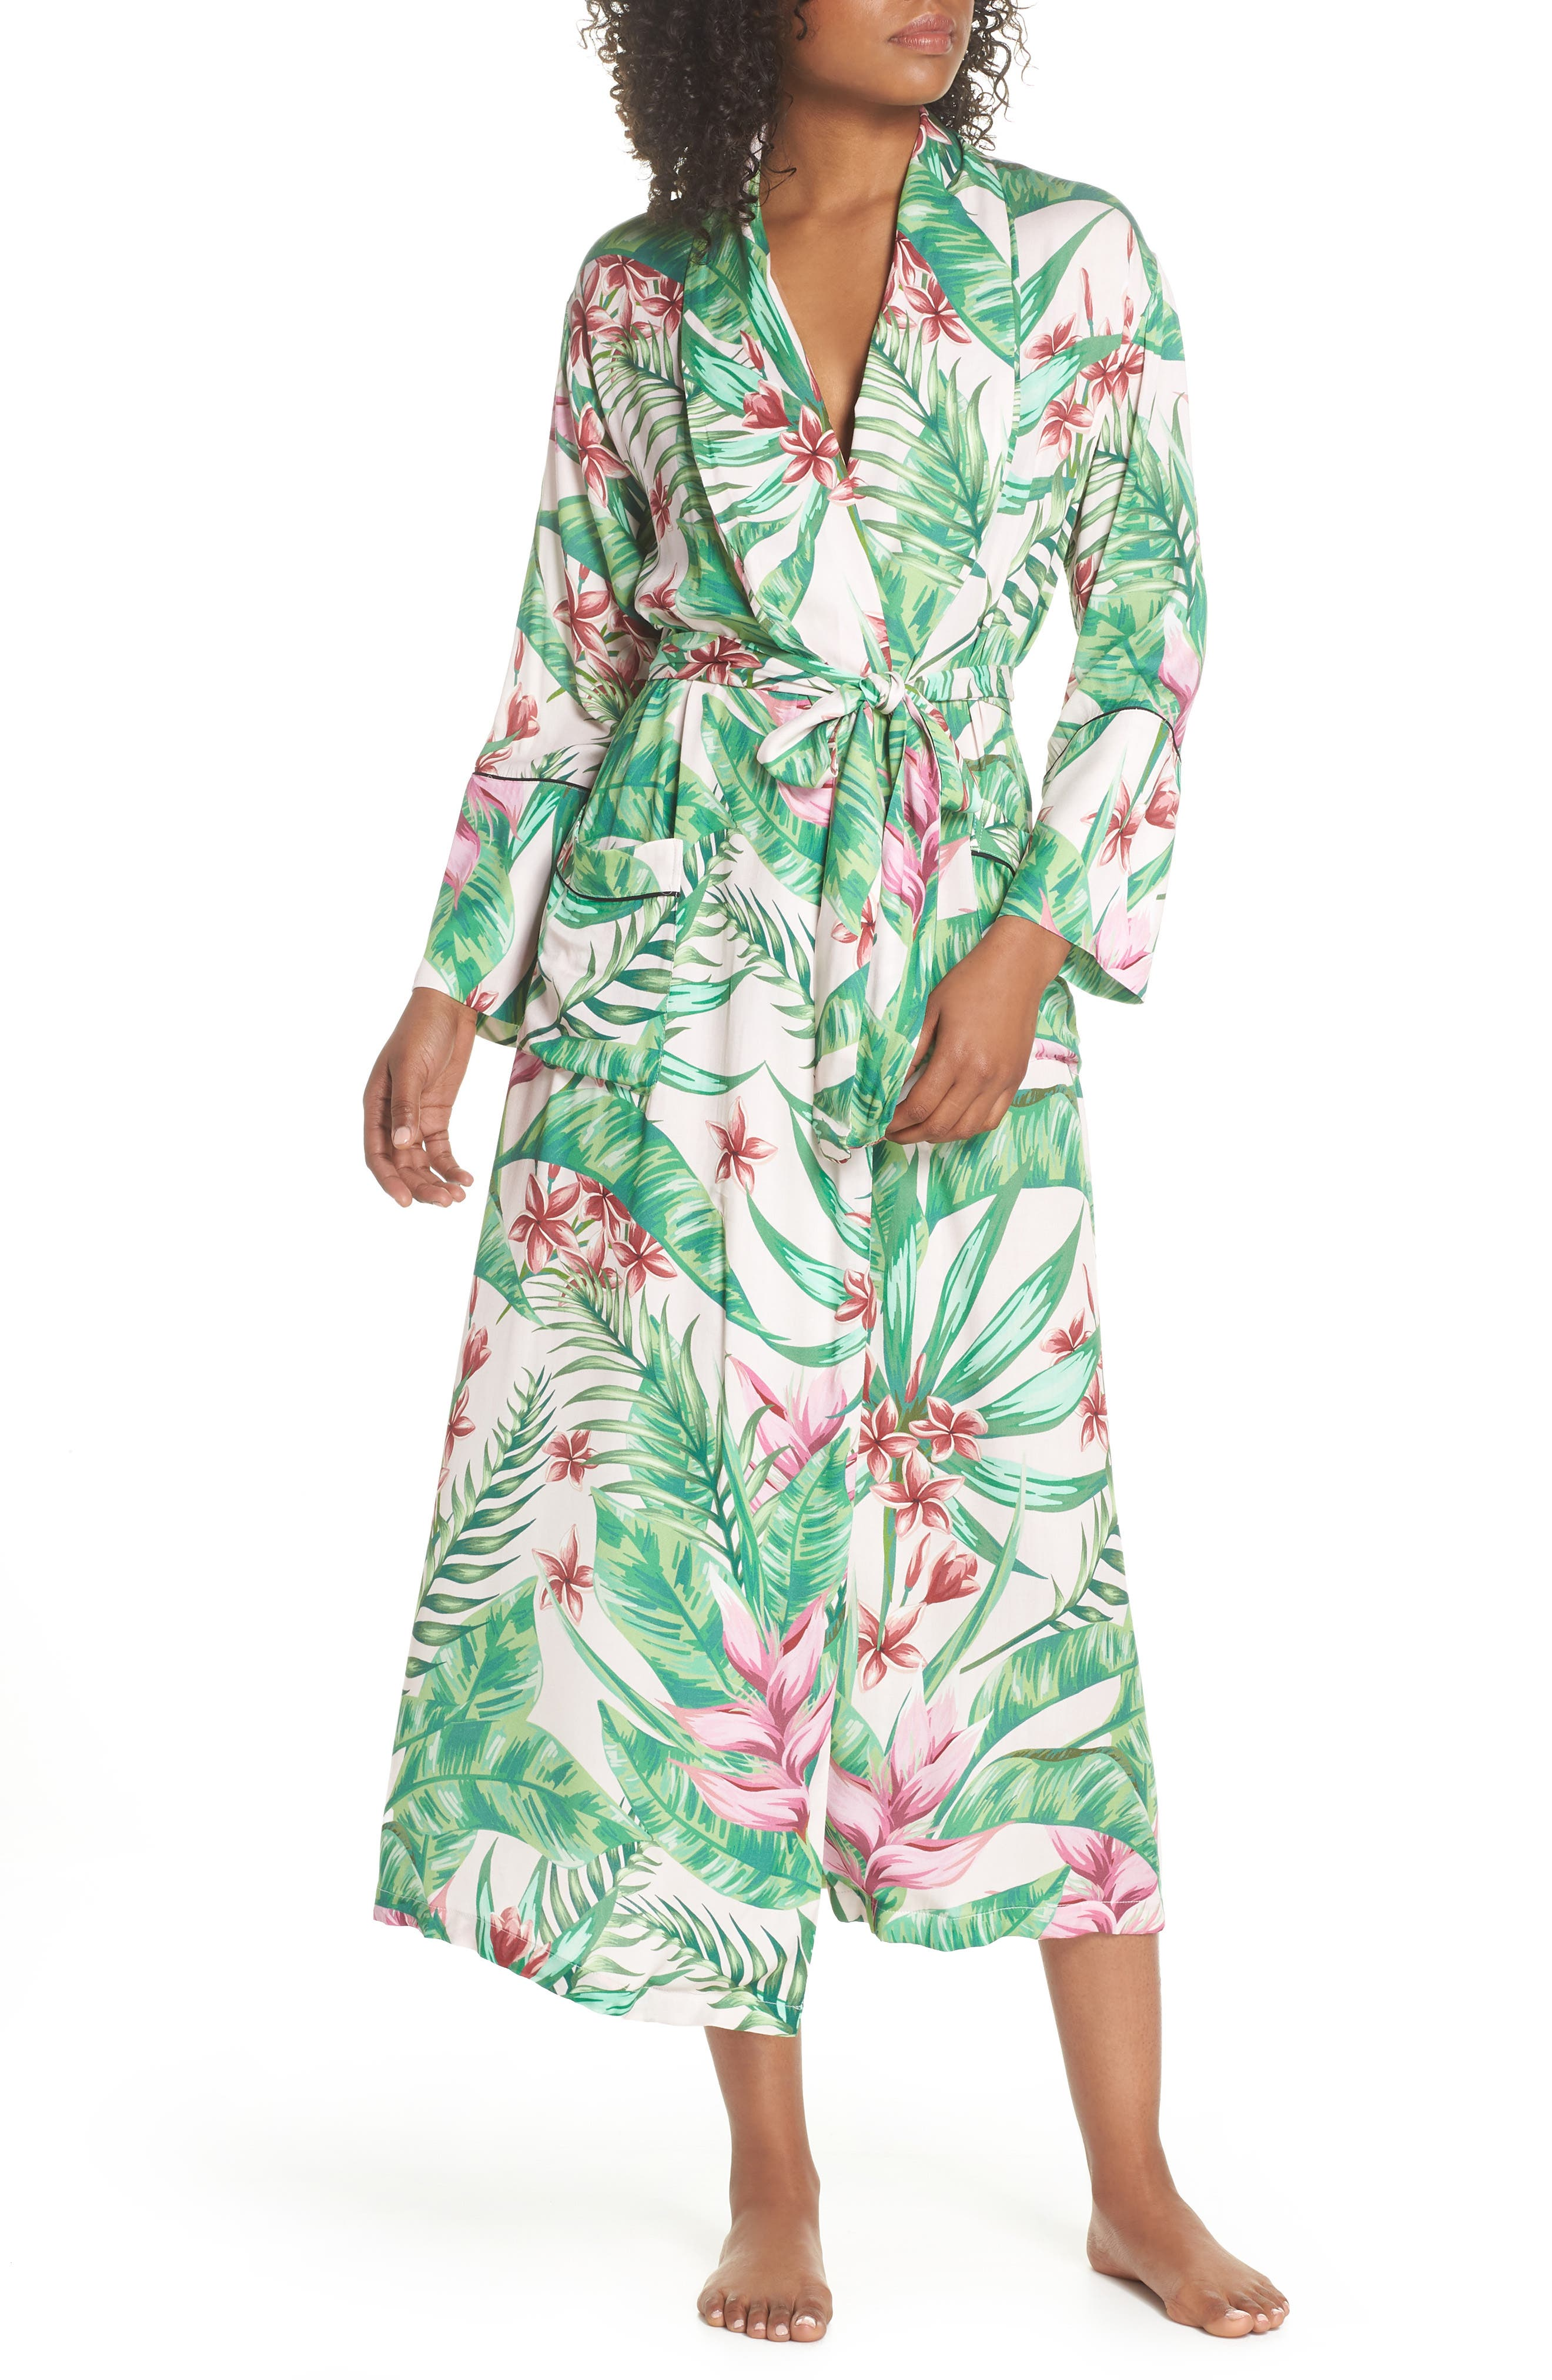 Floral Print Robe,                             Main thumbnail 1, color,                             Avalon Palm